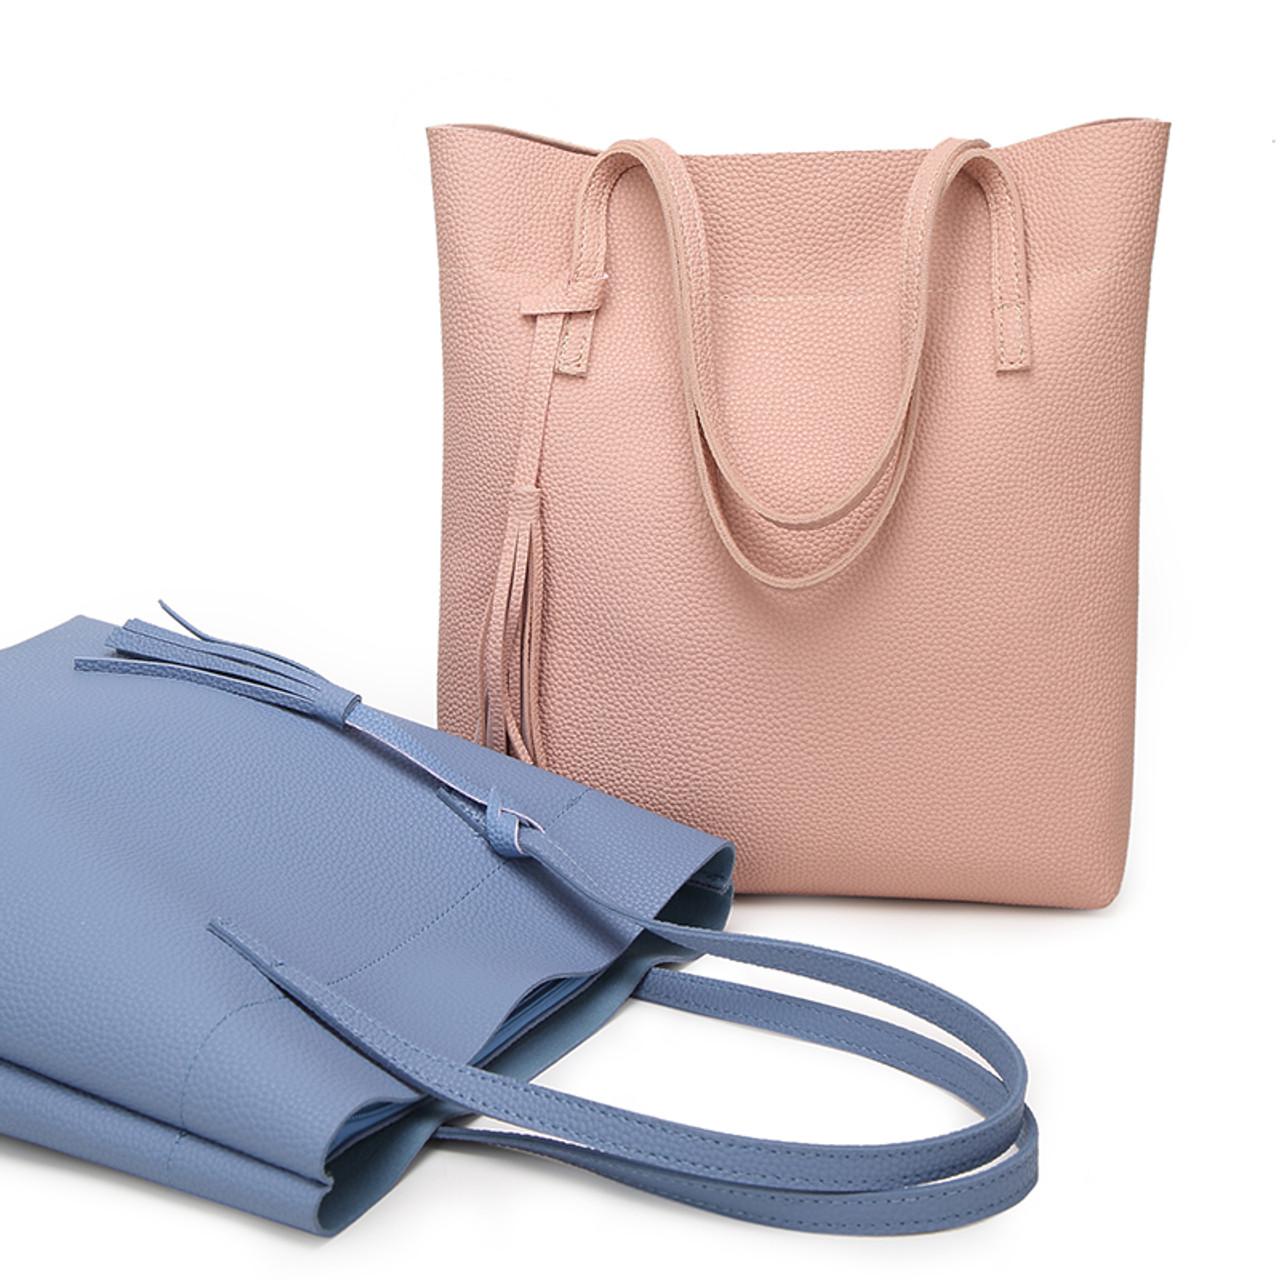 8a5afd7e7d91 ... Ankareeda Women s Soft Leather Handbag High Quality Women Shoulder Bag  Luxury Brand Tassel Bucket Bag Fashion ...